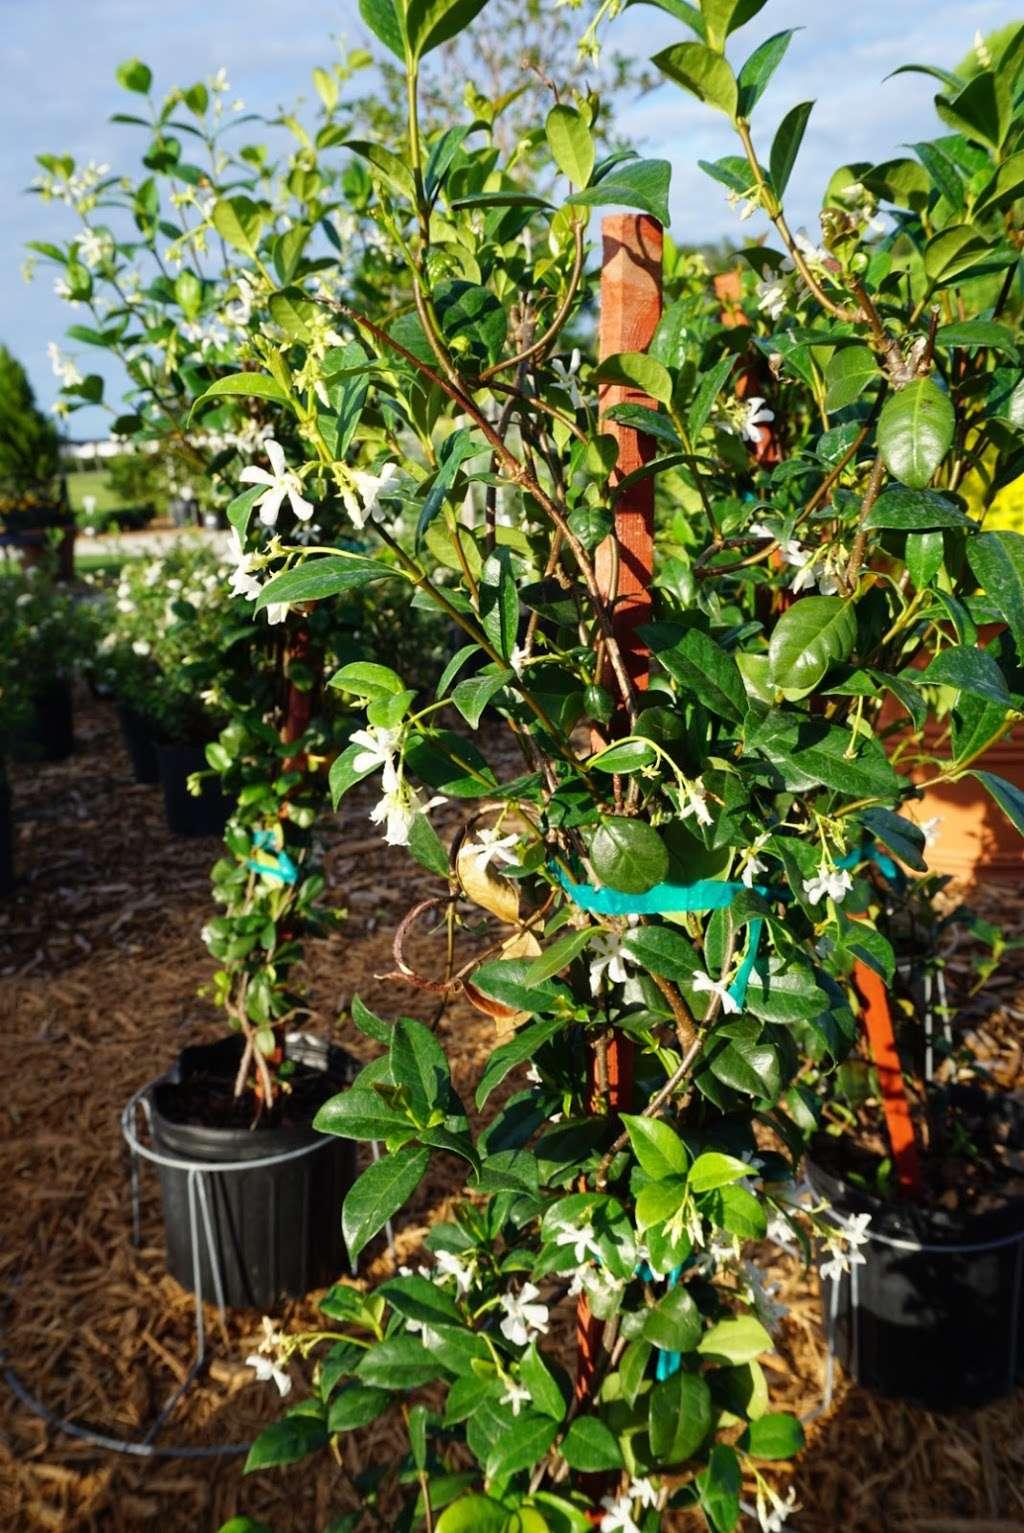 Select Growers - store    Photo 6 of 10   Address: 4391 FL-11, De Leon Springs, FL 32130, USA   Phone: (386) 734-8883